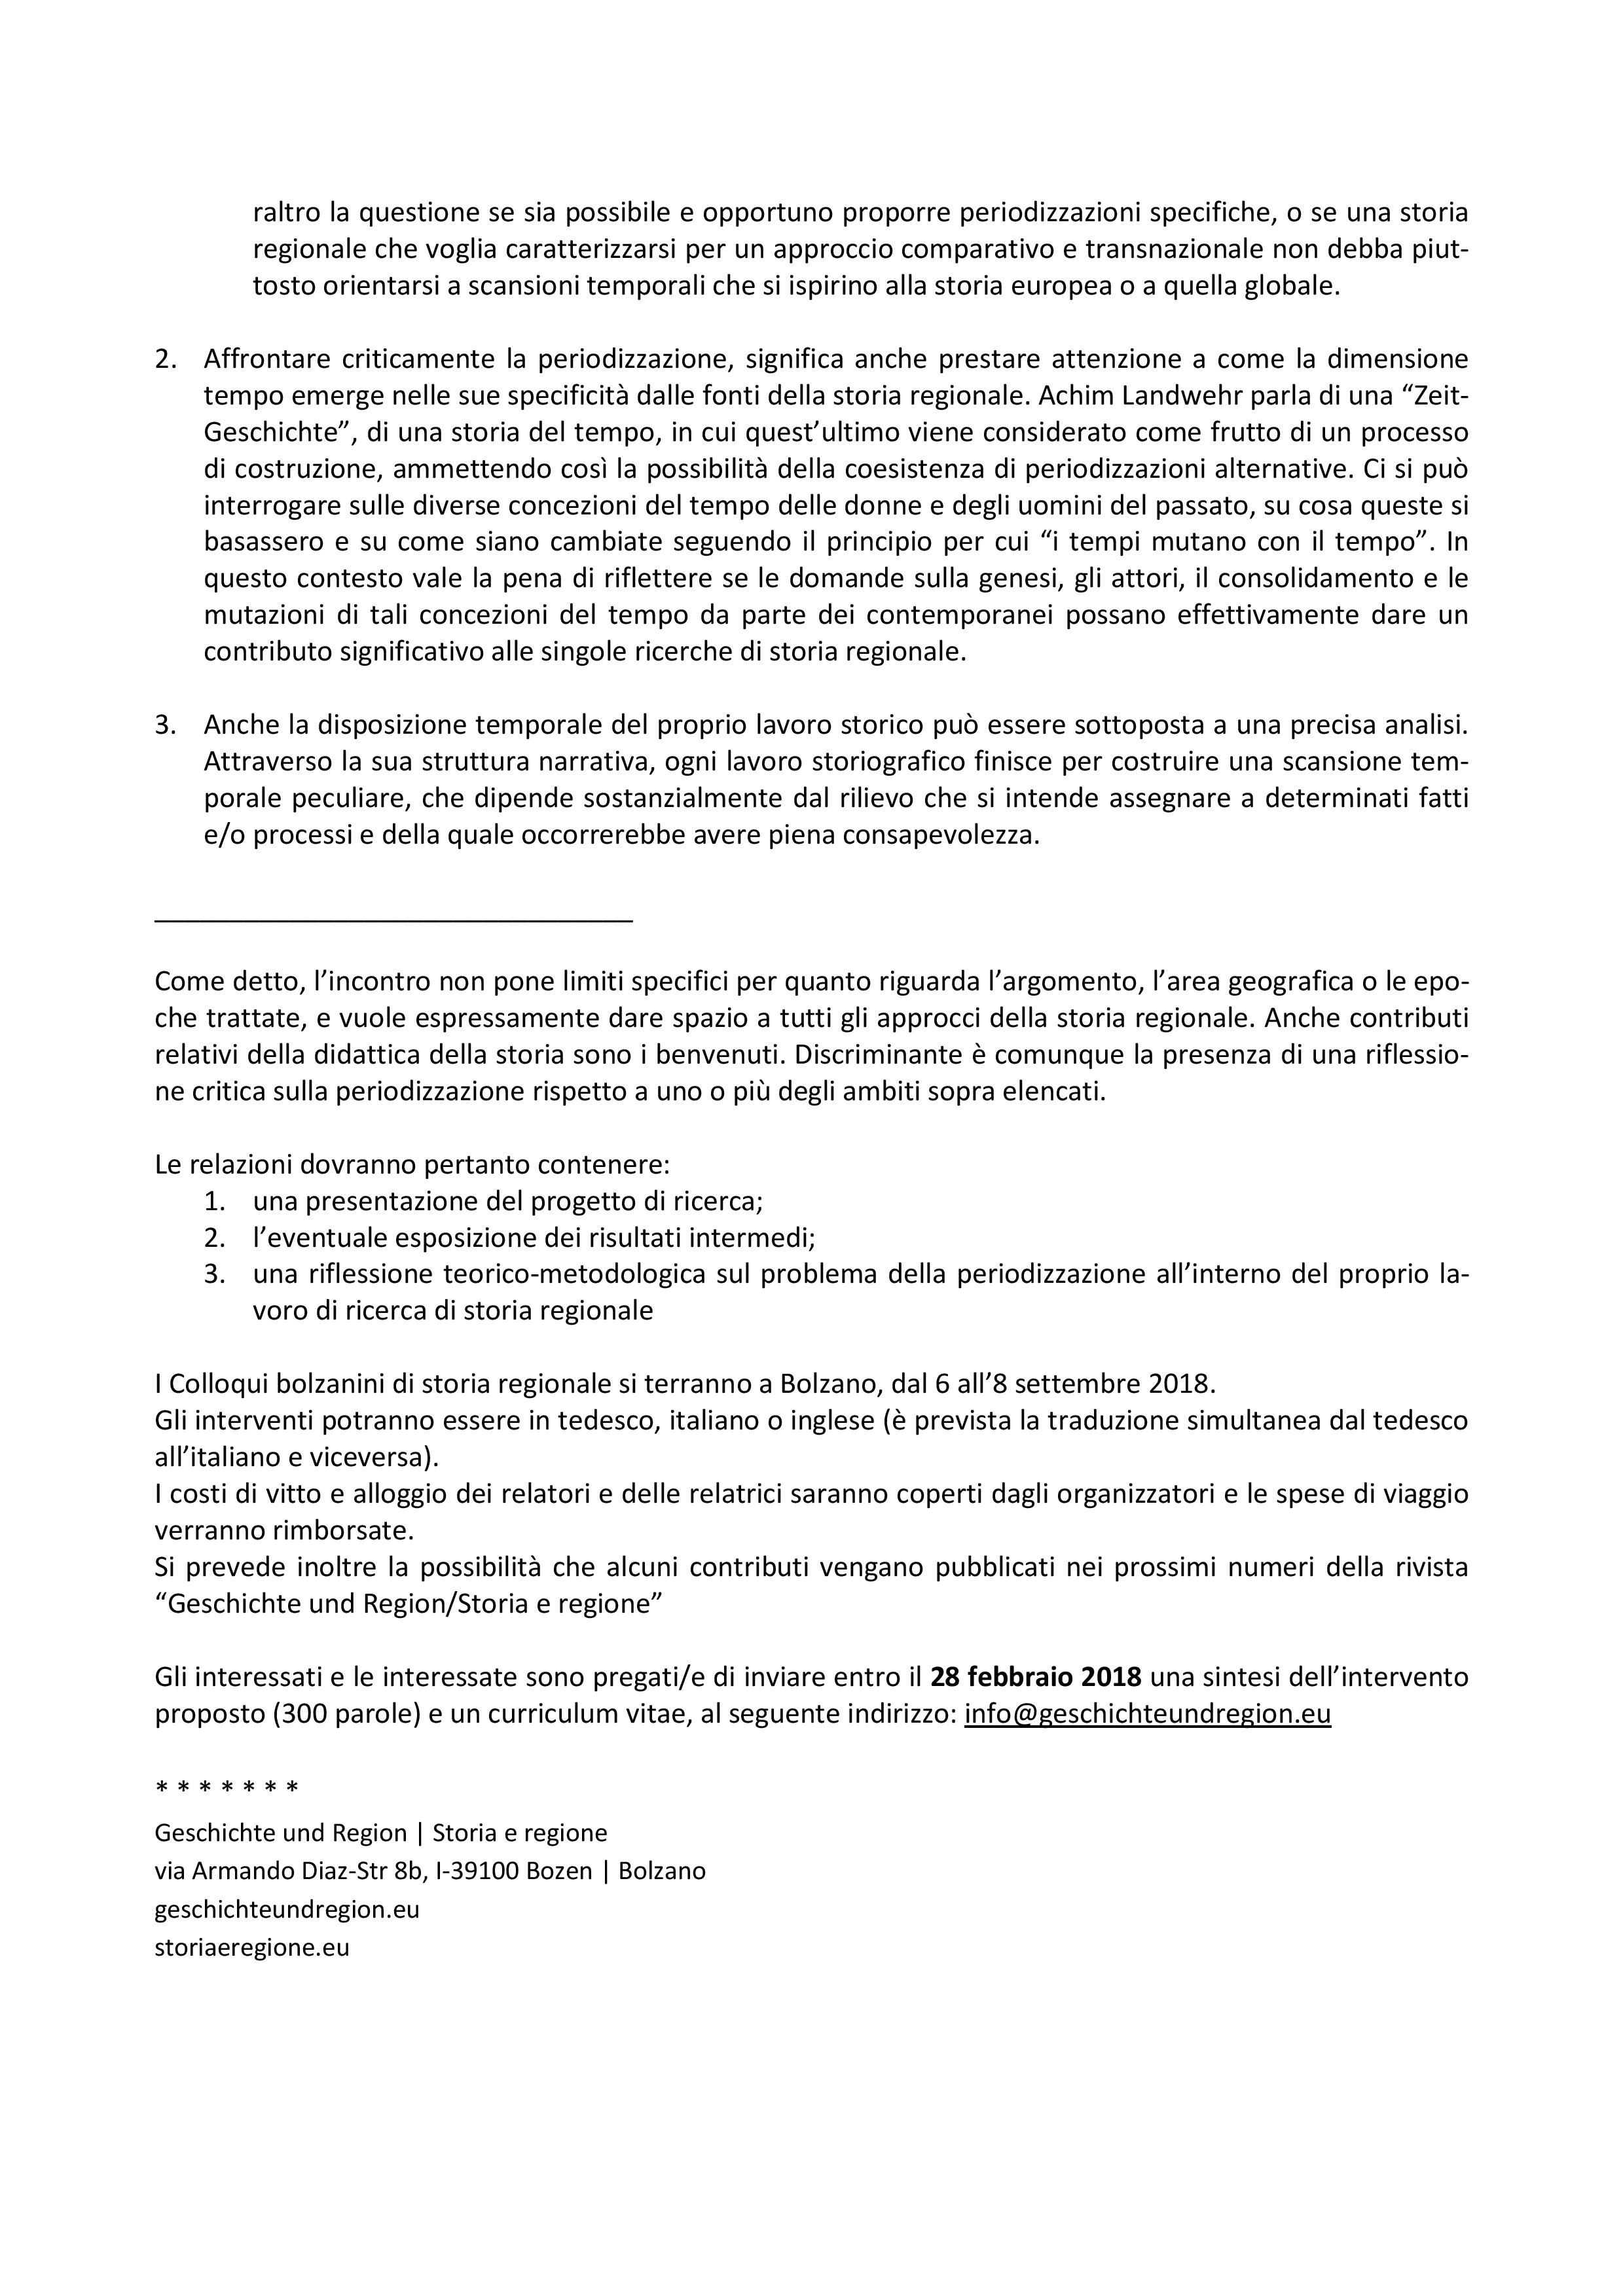 CfP Colloqui Bolzanini 2018 2-page-002